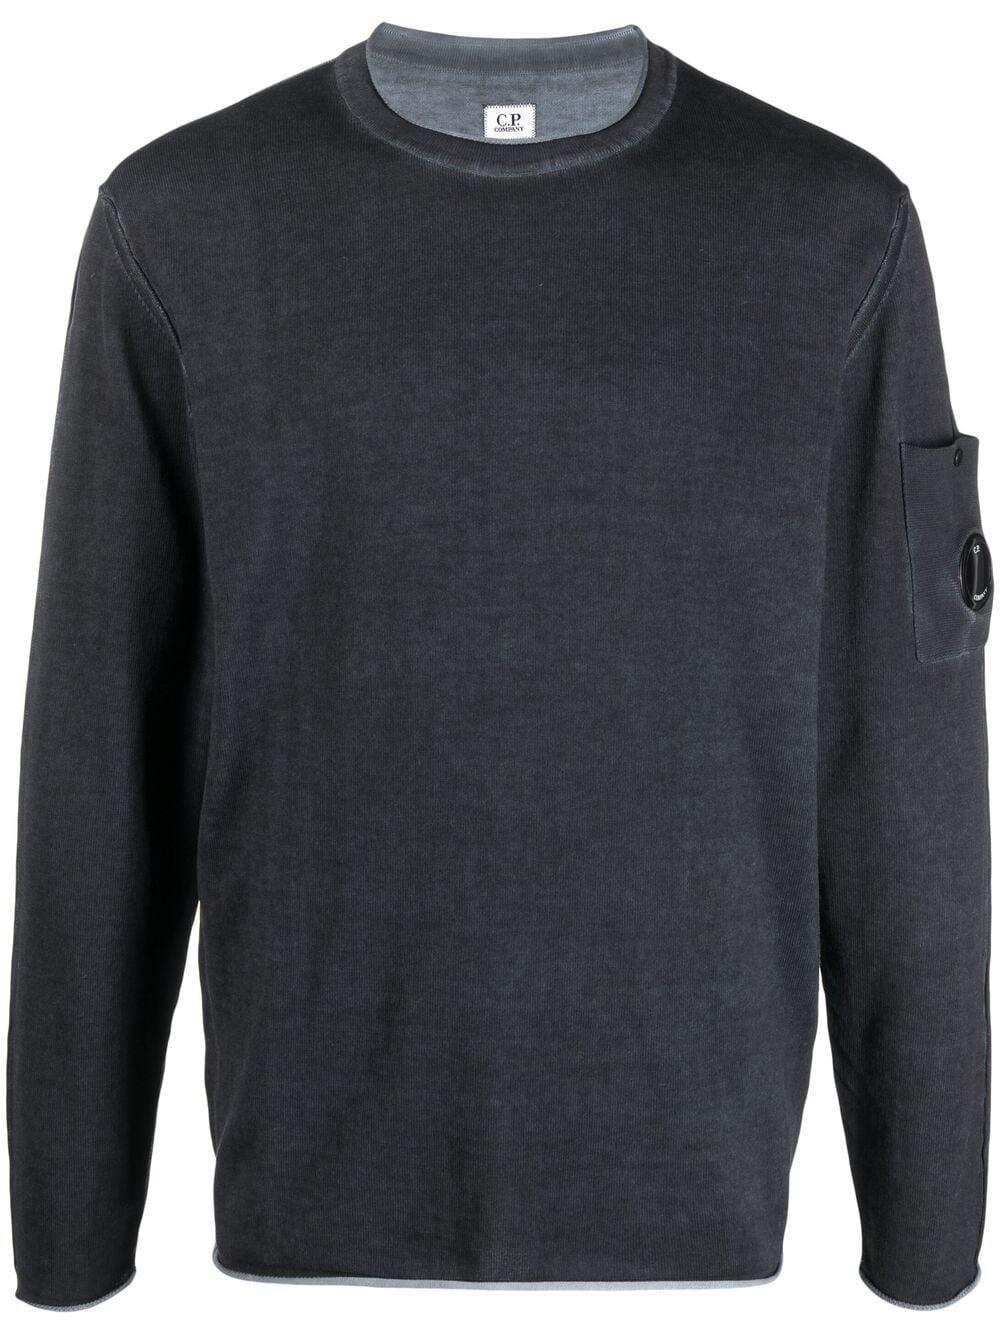 C.p. company crew neck sweat man C.P. COMPANY | Sweatshirts | 10CMKN279A004128S888